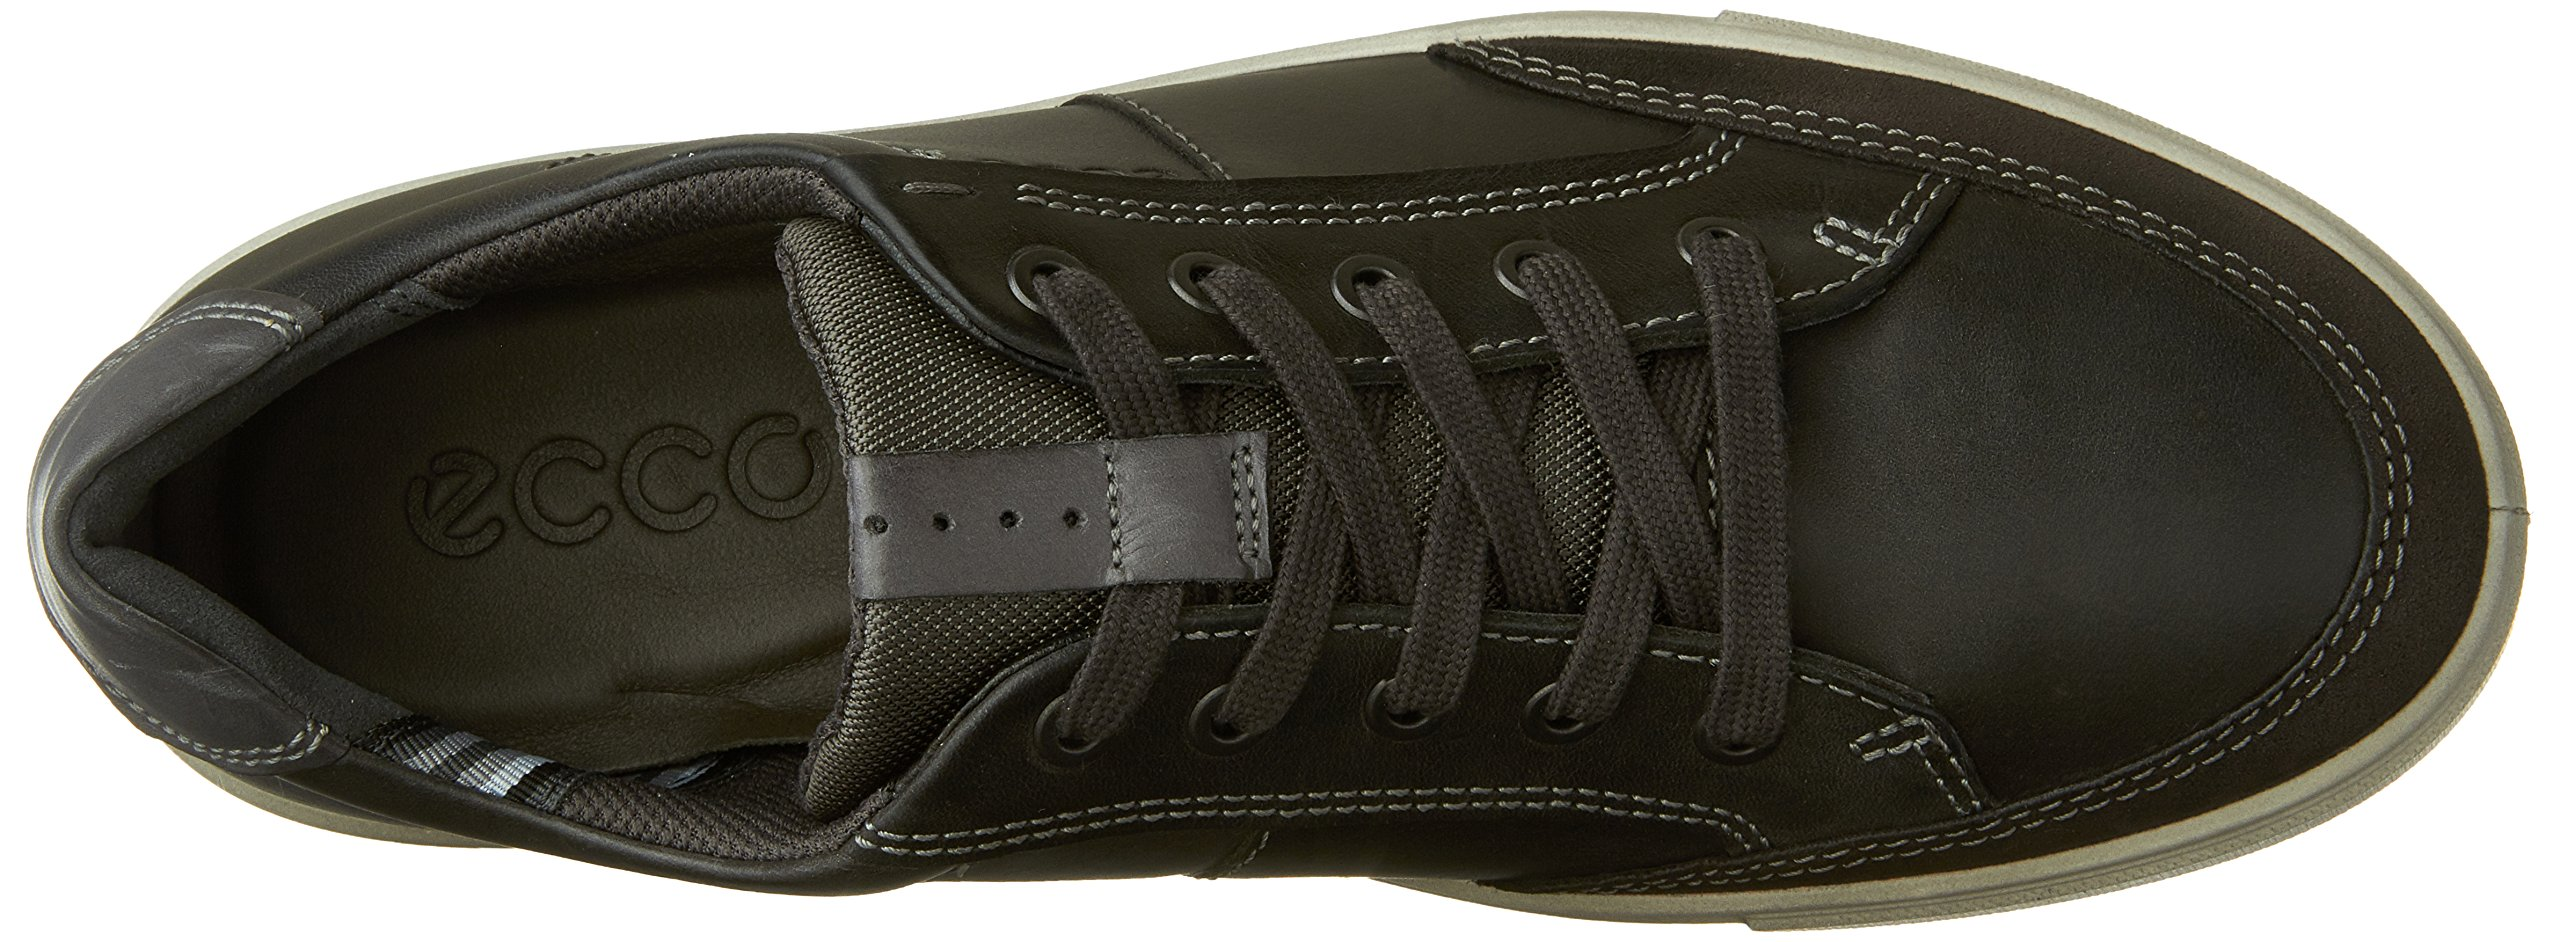 8f48a1c38122 ECCO Men s Kyle Classic Fashion Sneaker - 530734-02001   Fashion Sneakers    Clothing